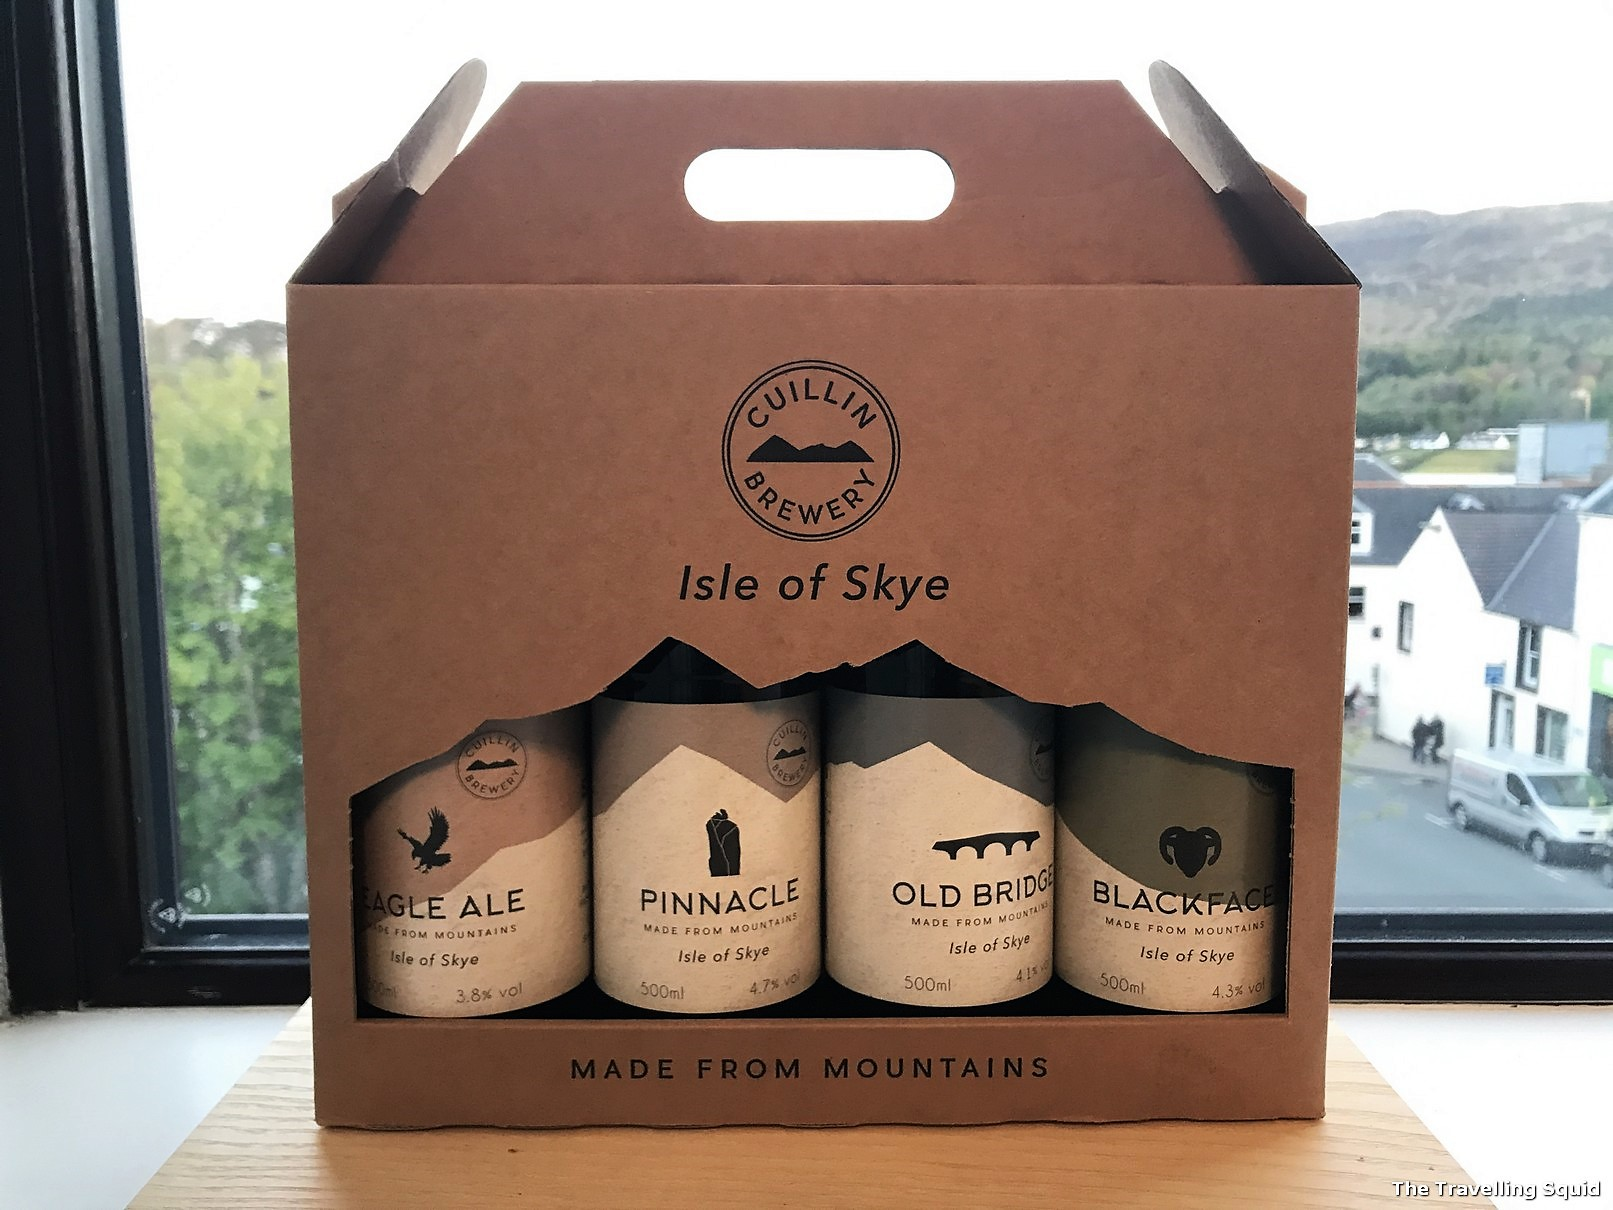 Review cuillin brewery isle of skye